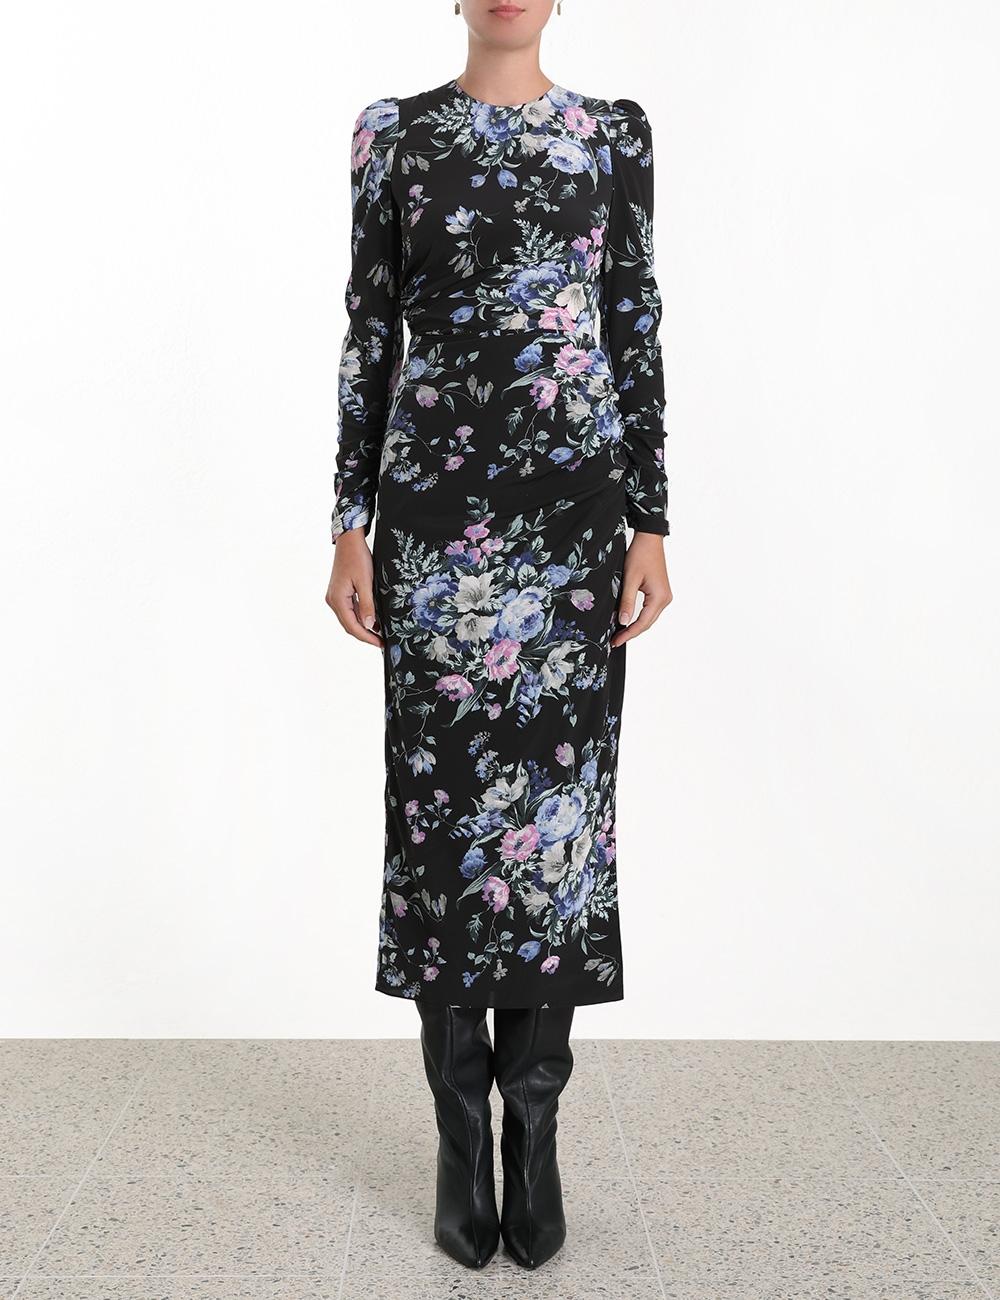 Moncur Drape Dress